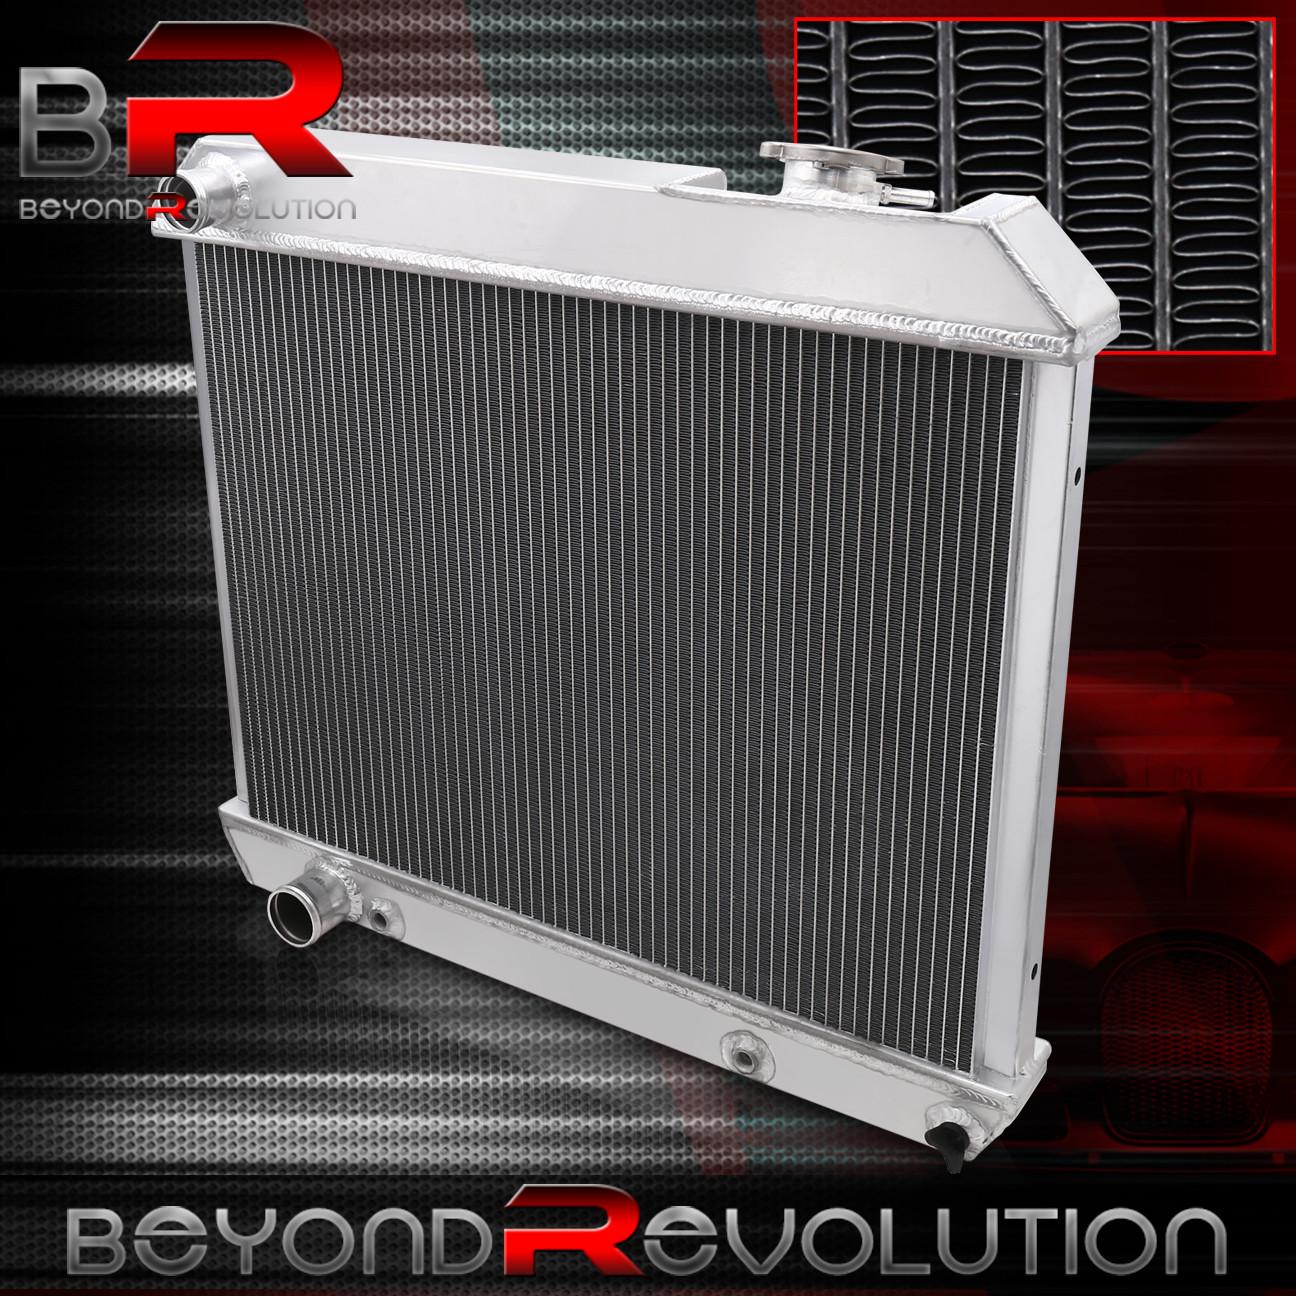 3 Row Aluminum Radiator for Cadillac Deville 60-65 1960 1961 1962 1963 1964 1965